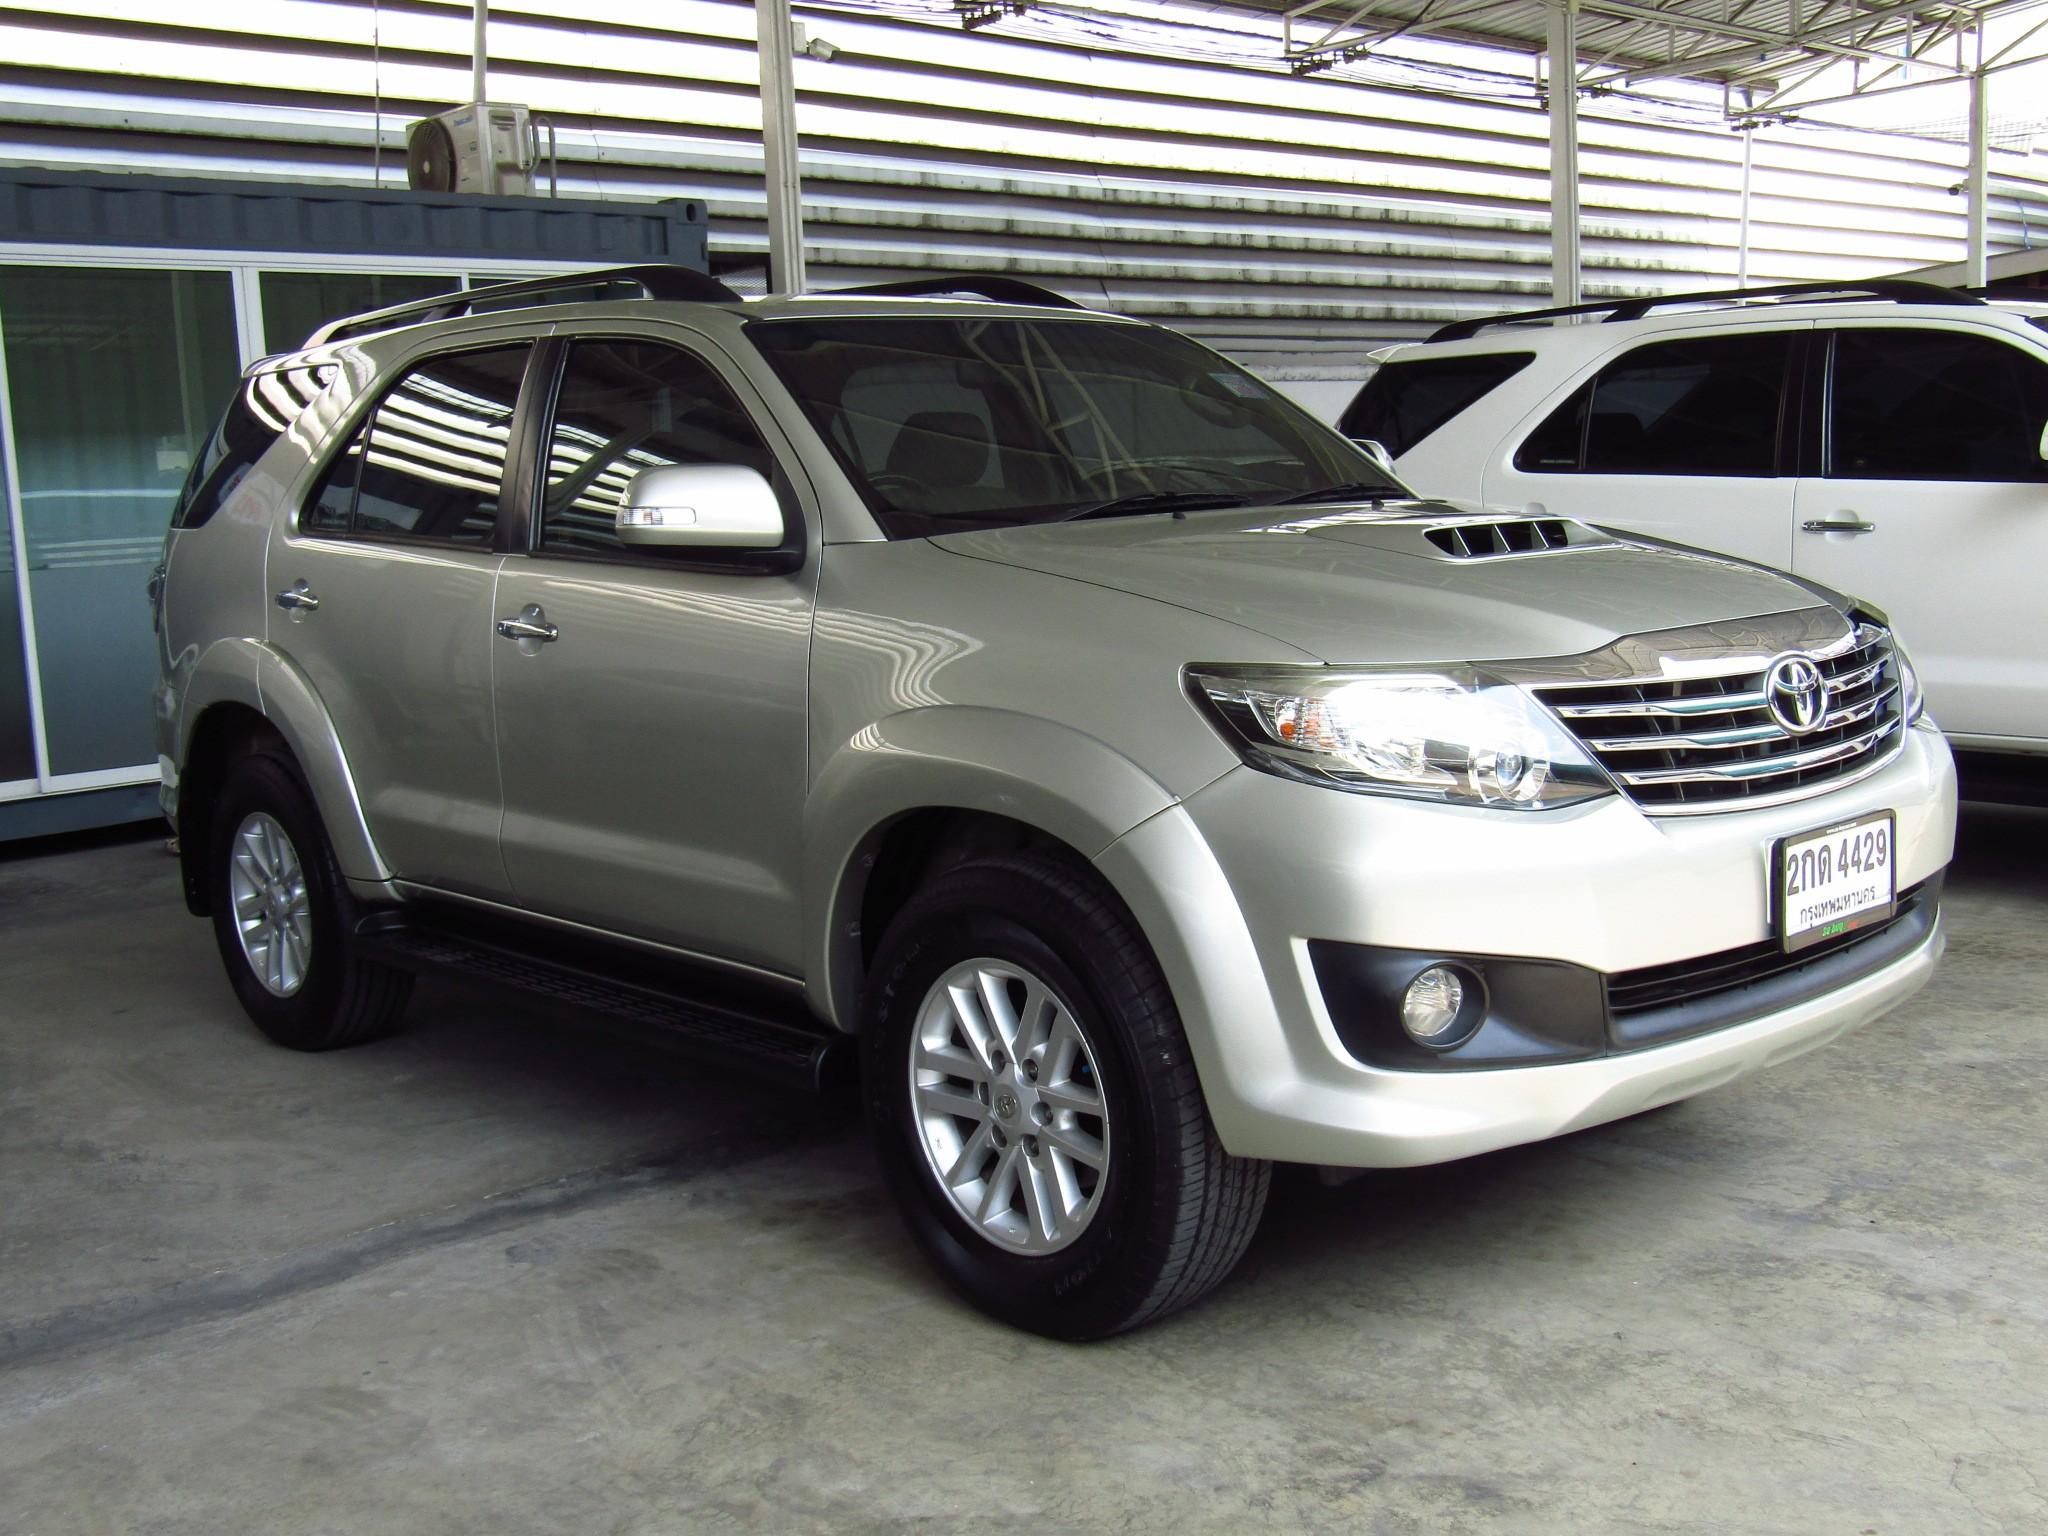 Toyota Fortuner (96,xxx)  3.0V 2WD AT SUV (ผ่อน 13,070บาท*60เดือน)